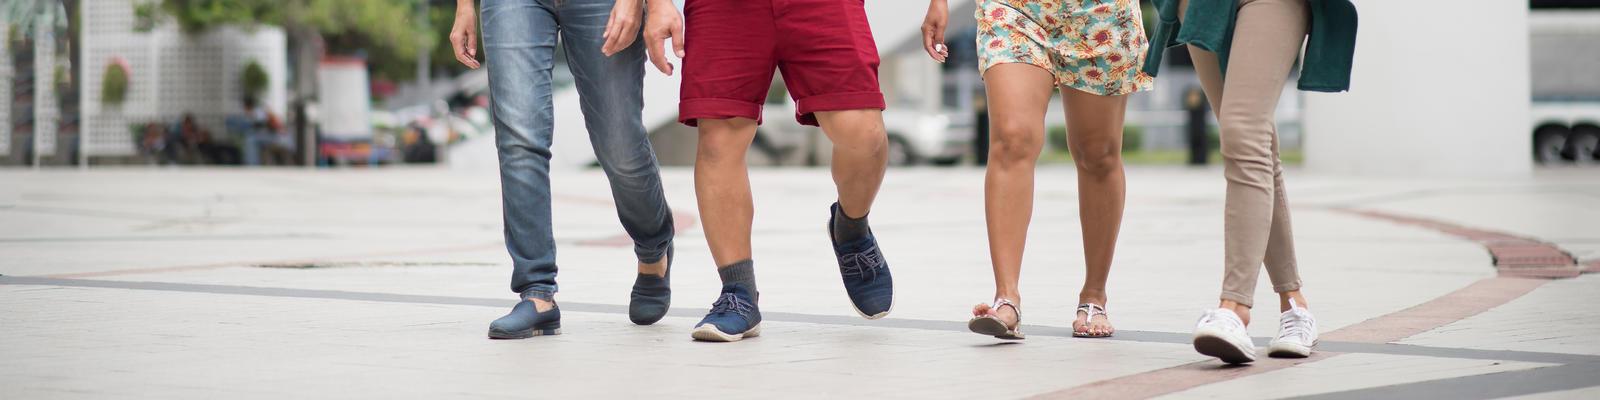 Group of friends walking on the street (Photo: crazystocker/Shutterstock)